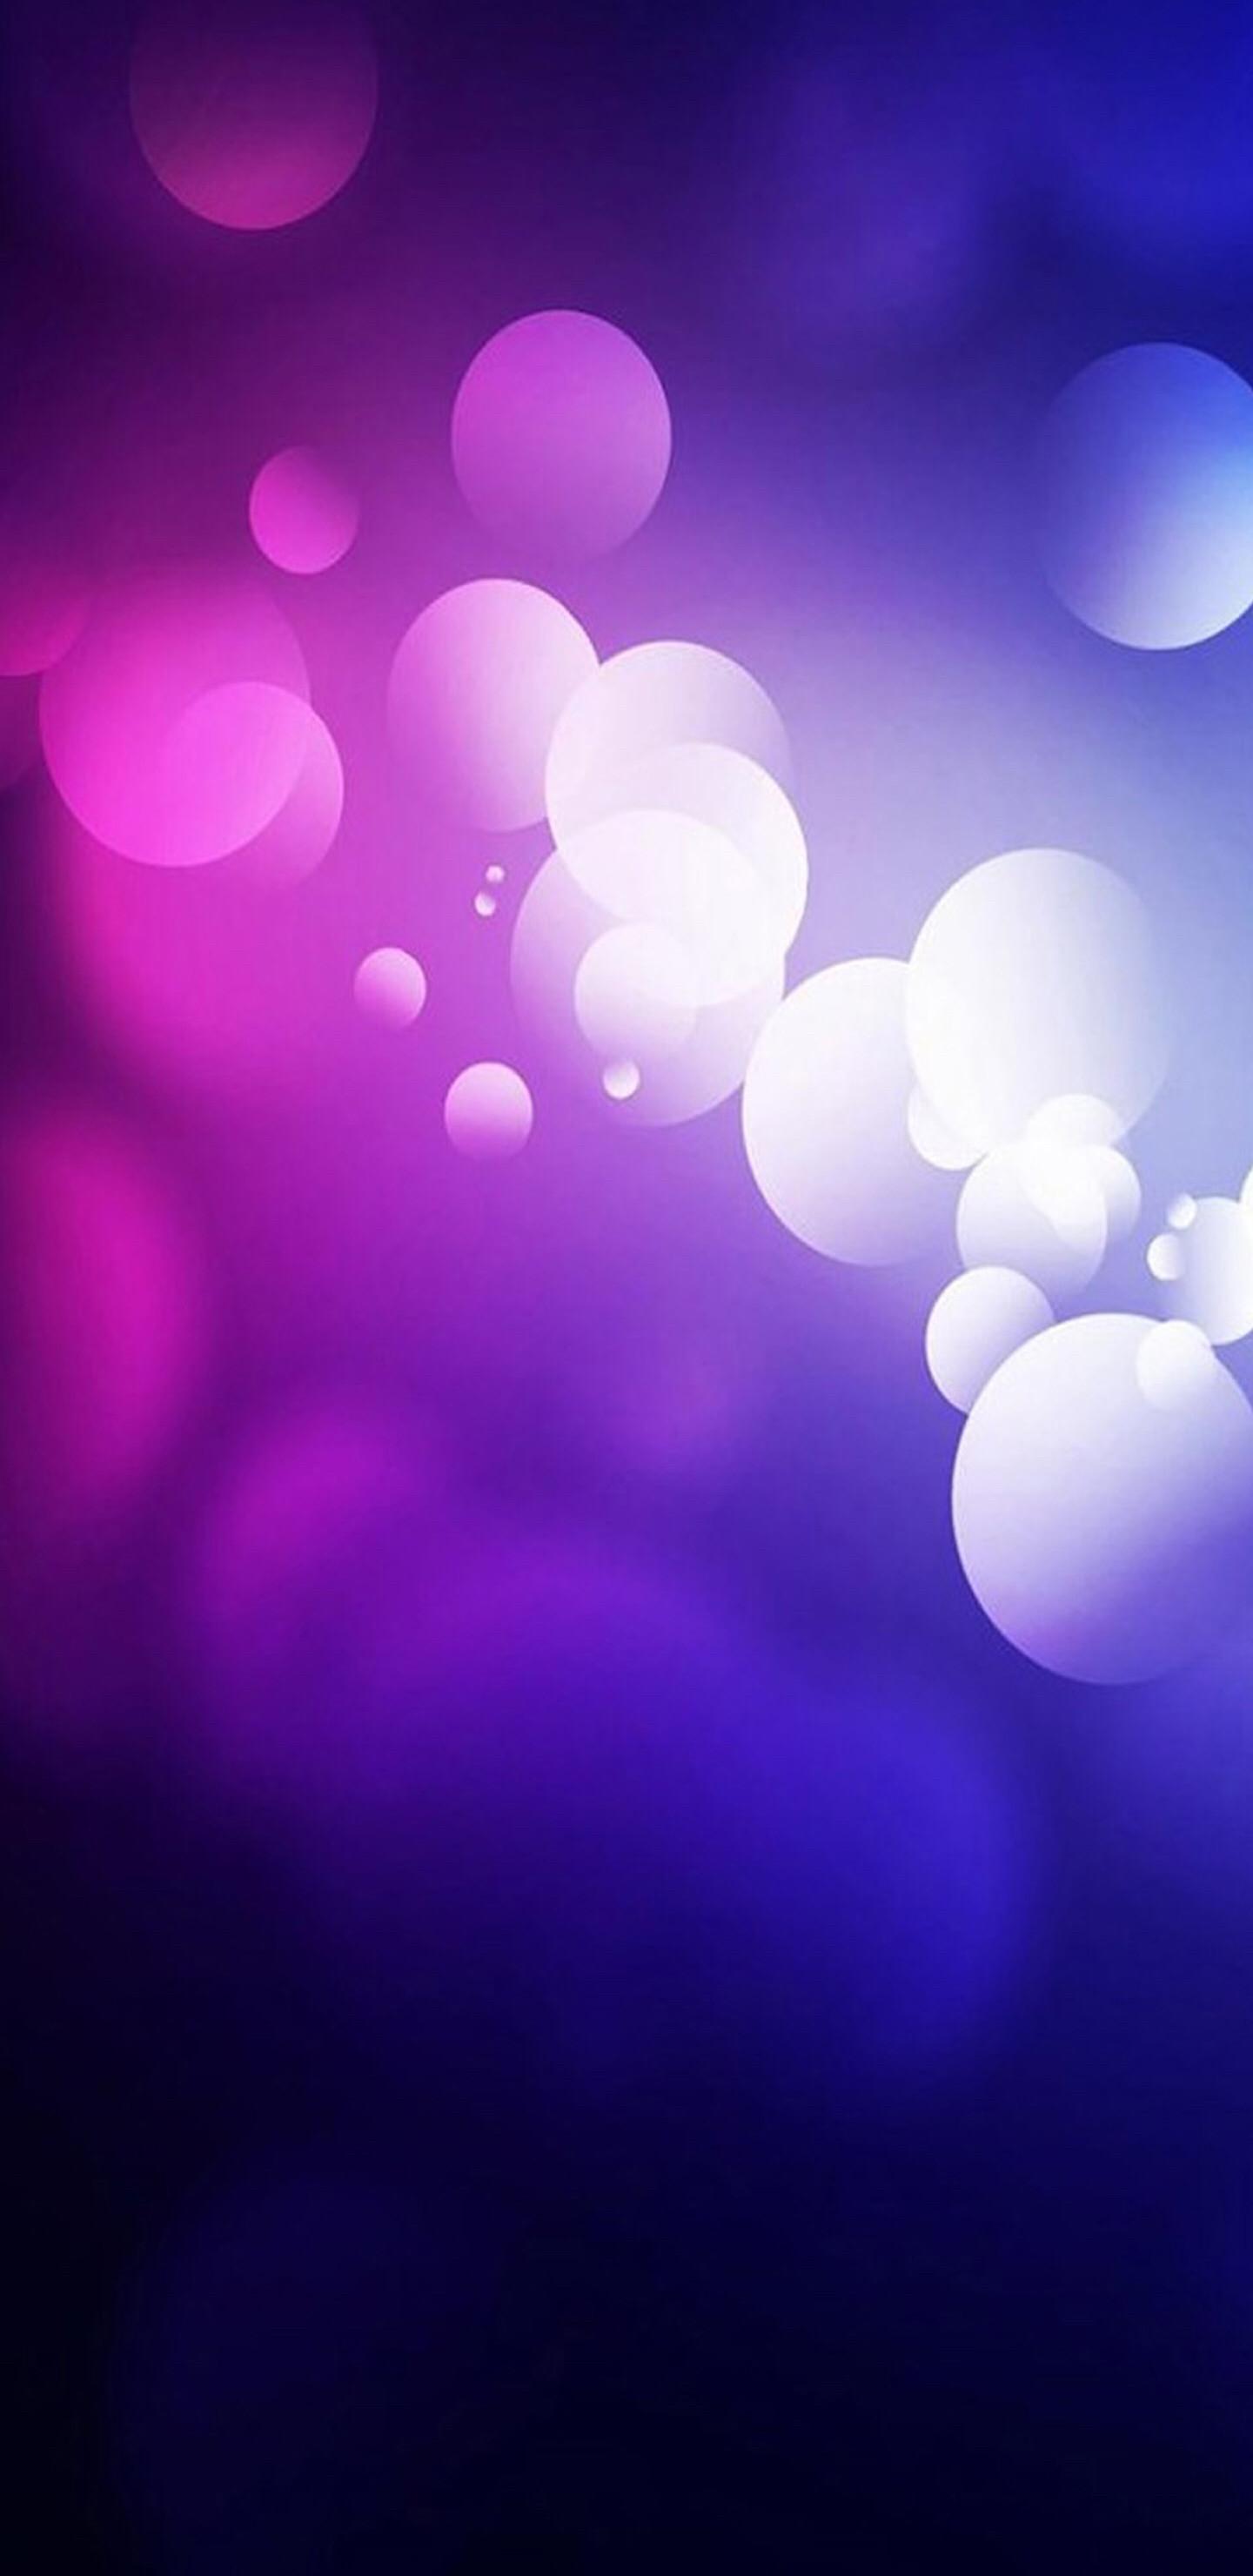 Blue, purple, minimal, abstract, wallpaper, galaxy, clean, beauty,